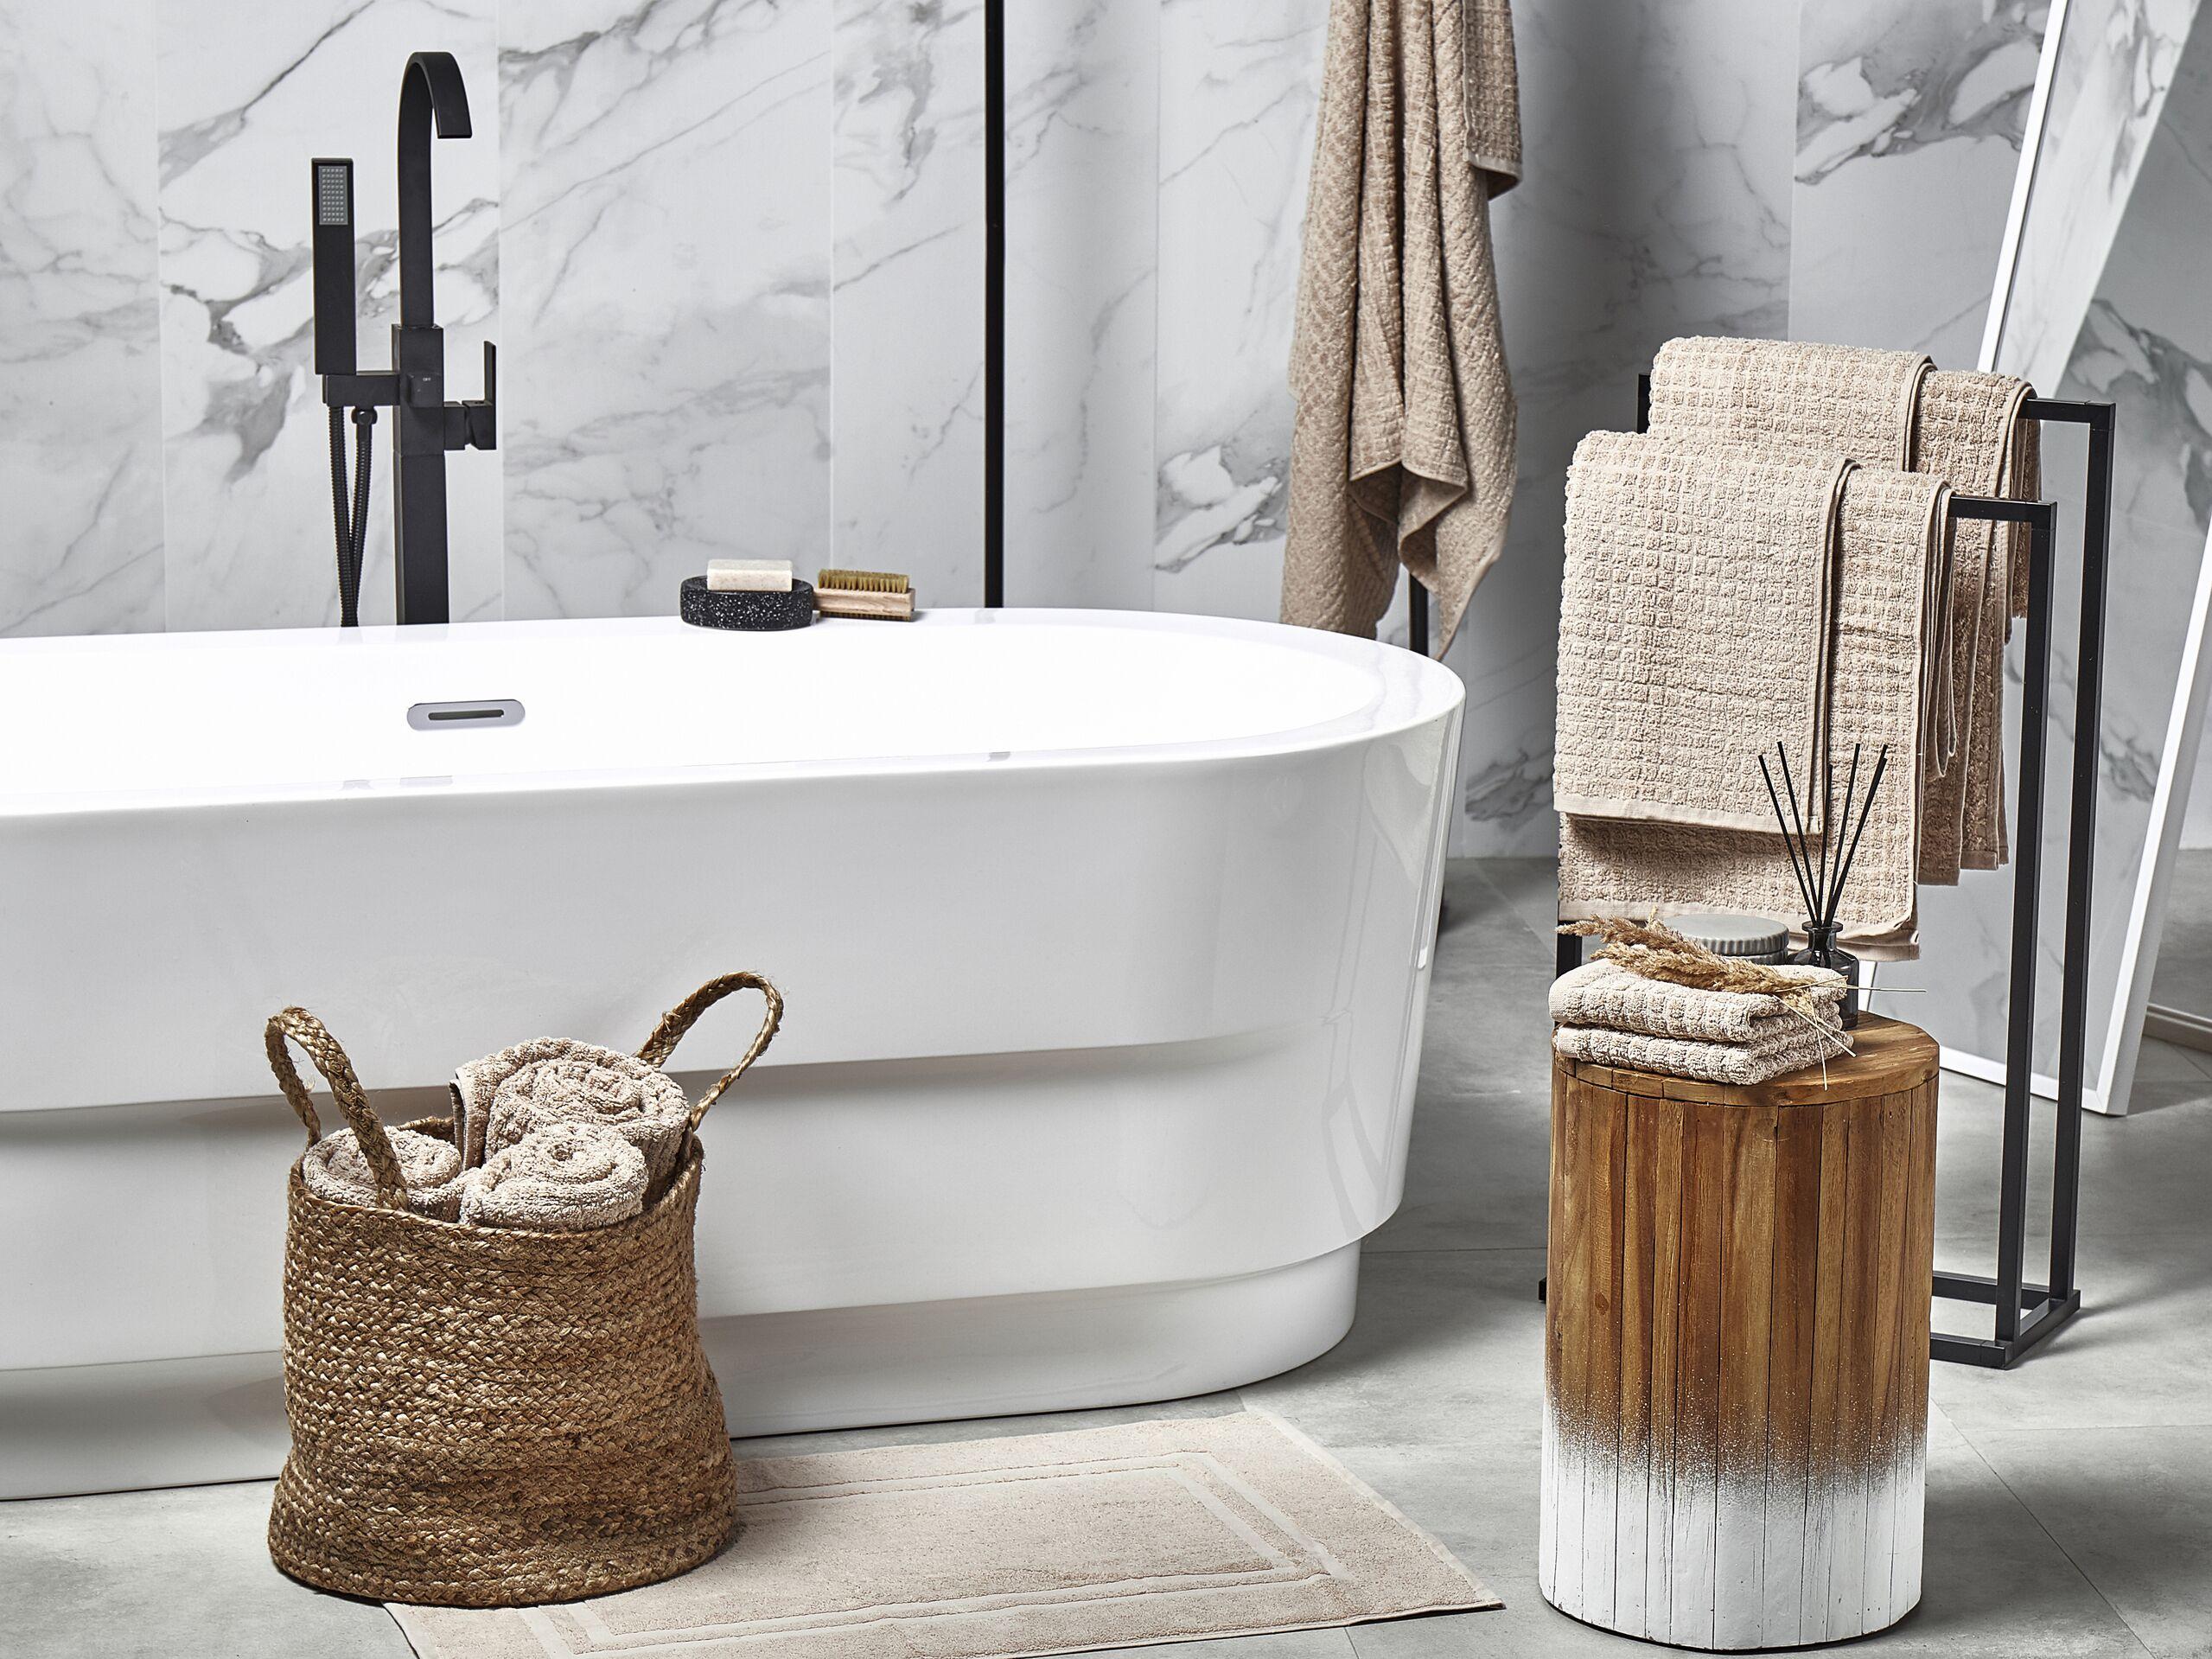 beliani set di 11 asciugamani beige da bagno in morbido cotone low twist accessori bagno